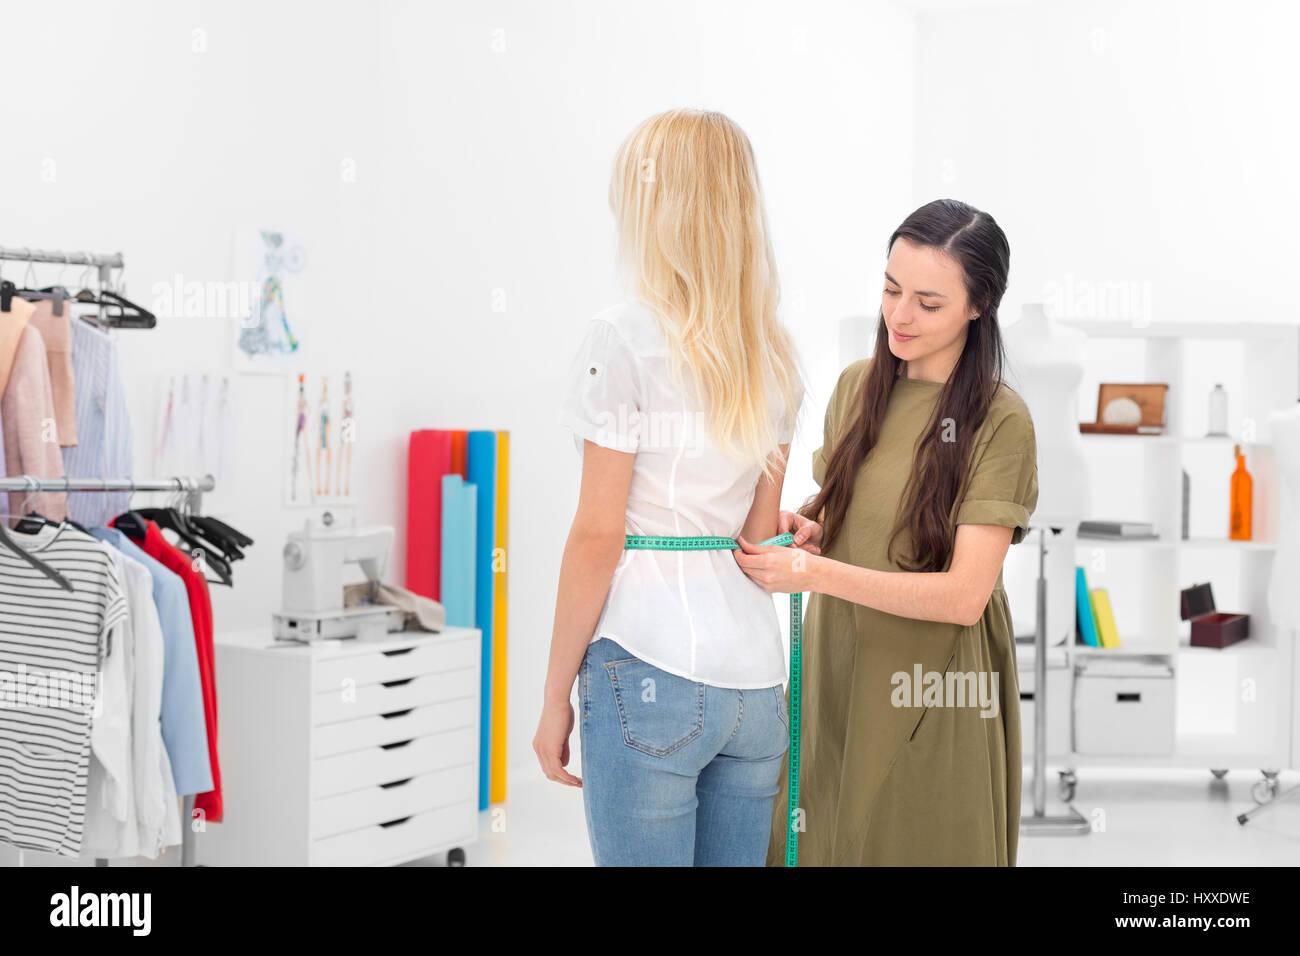 junge Schneiderin bekommt Taille Maßnahmen des Kunden im showroom Stockbild